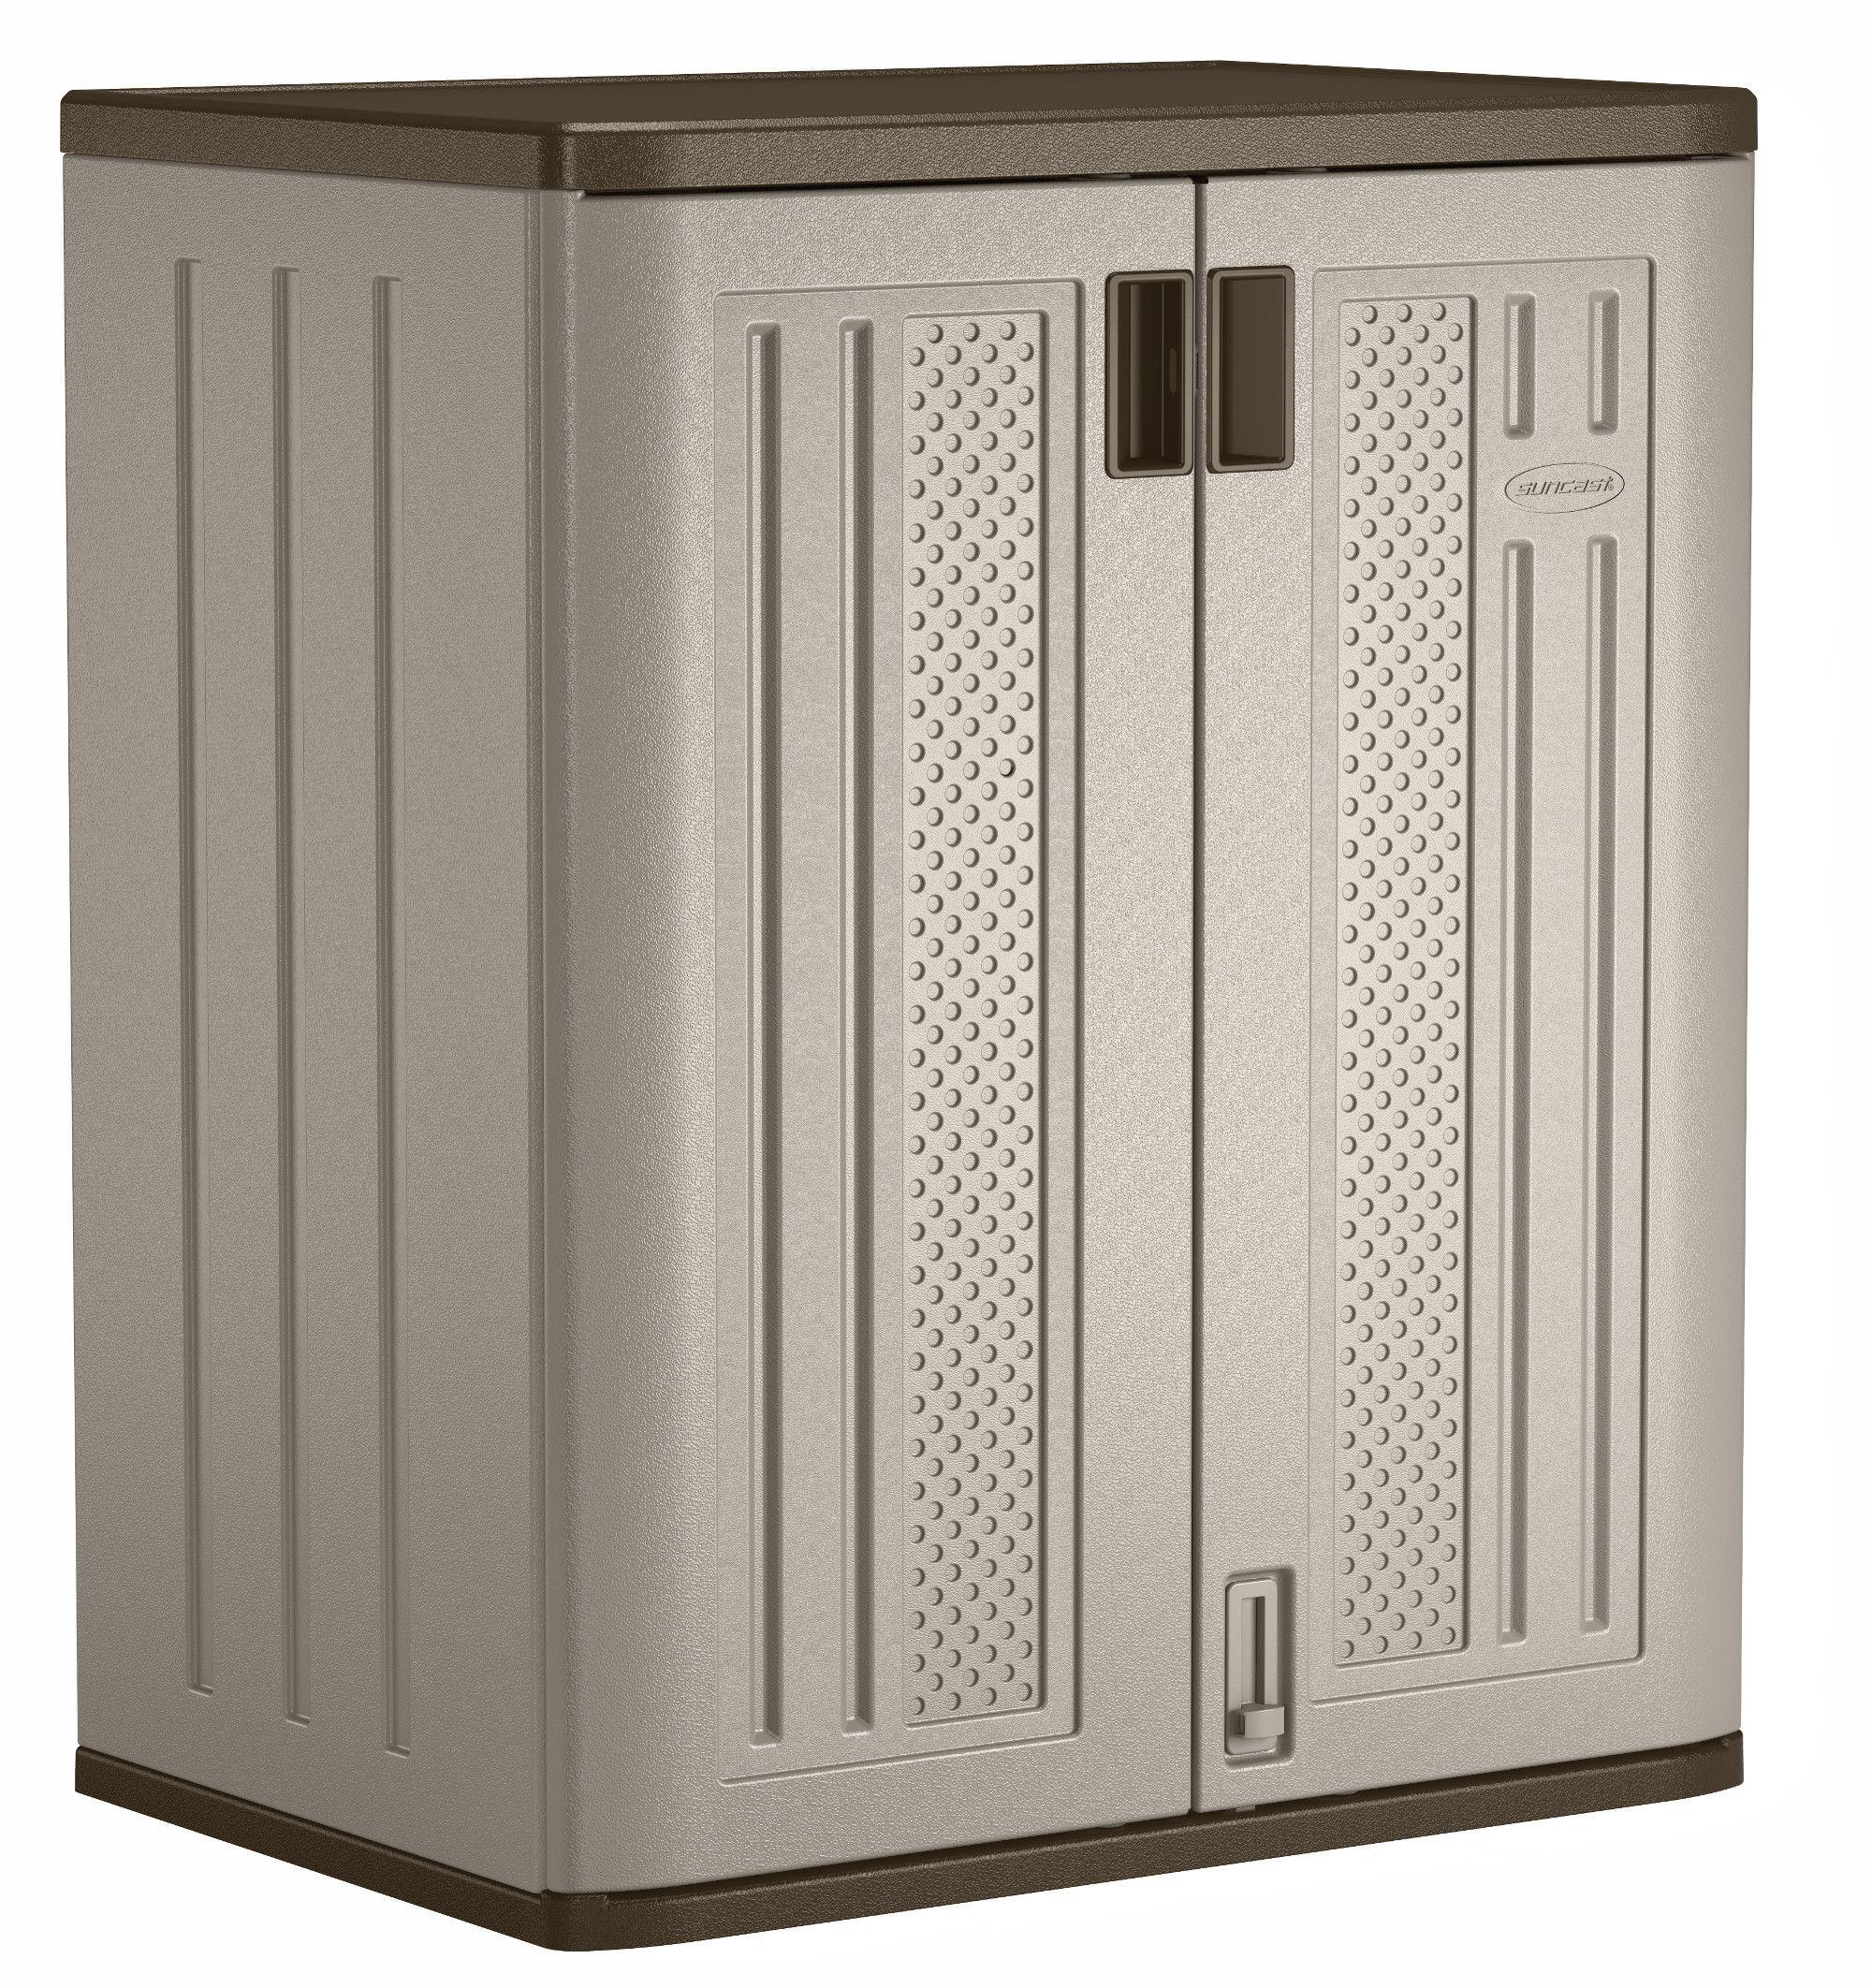 Suncast 36 Resin Storage Cabinet Locker For Garage Home Shed Gray Walmart Com In 2020 Outdoor Storage Cabinet Resin Storage Utility Storage Cabinet